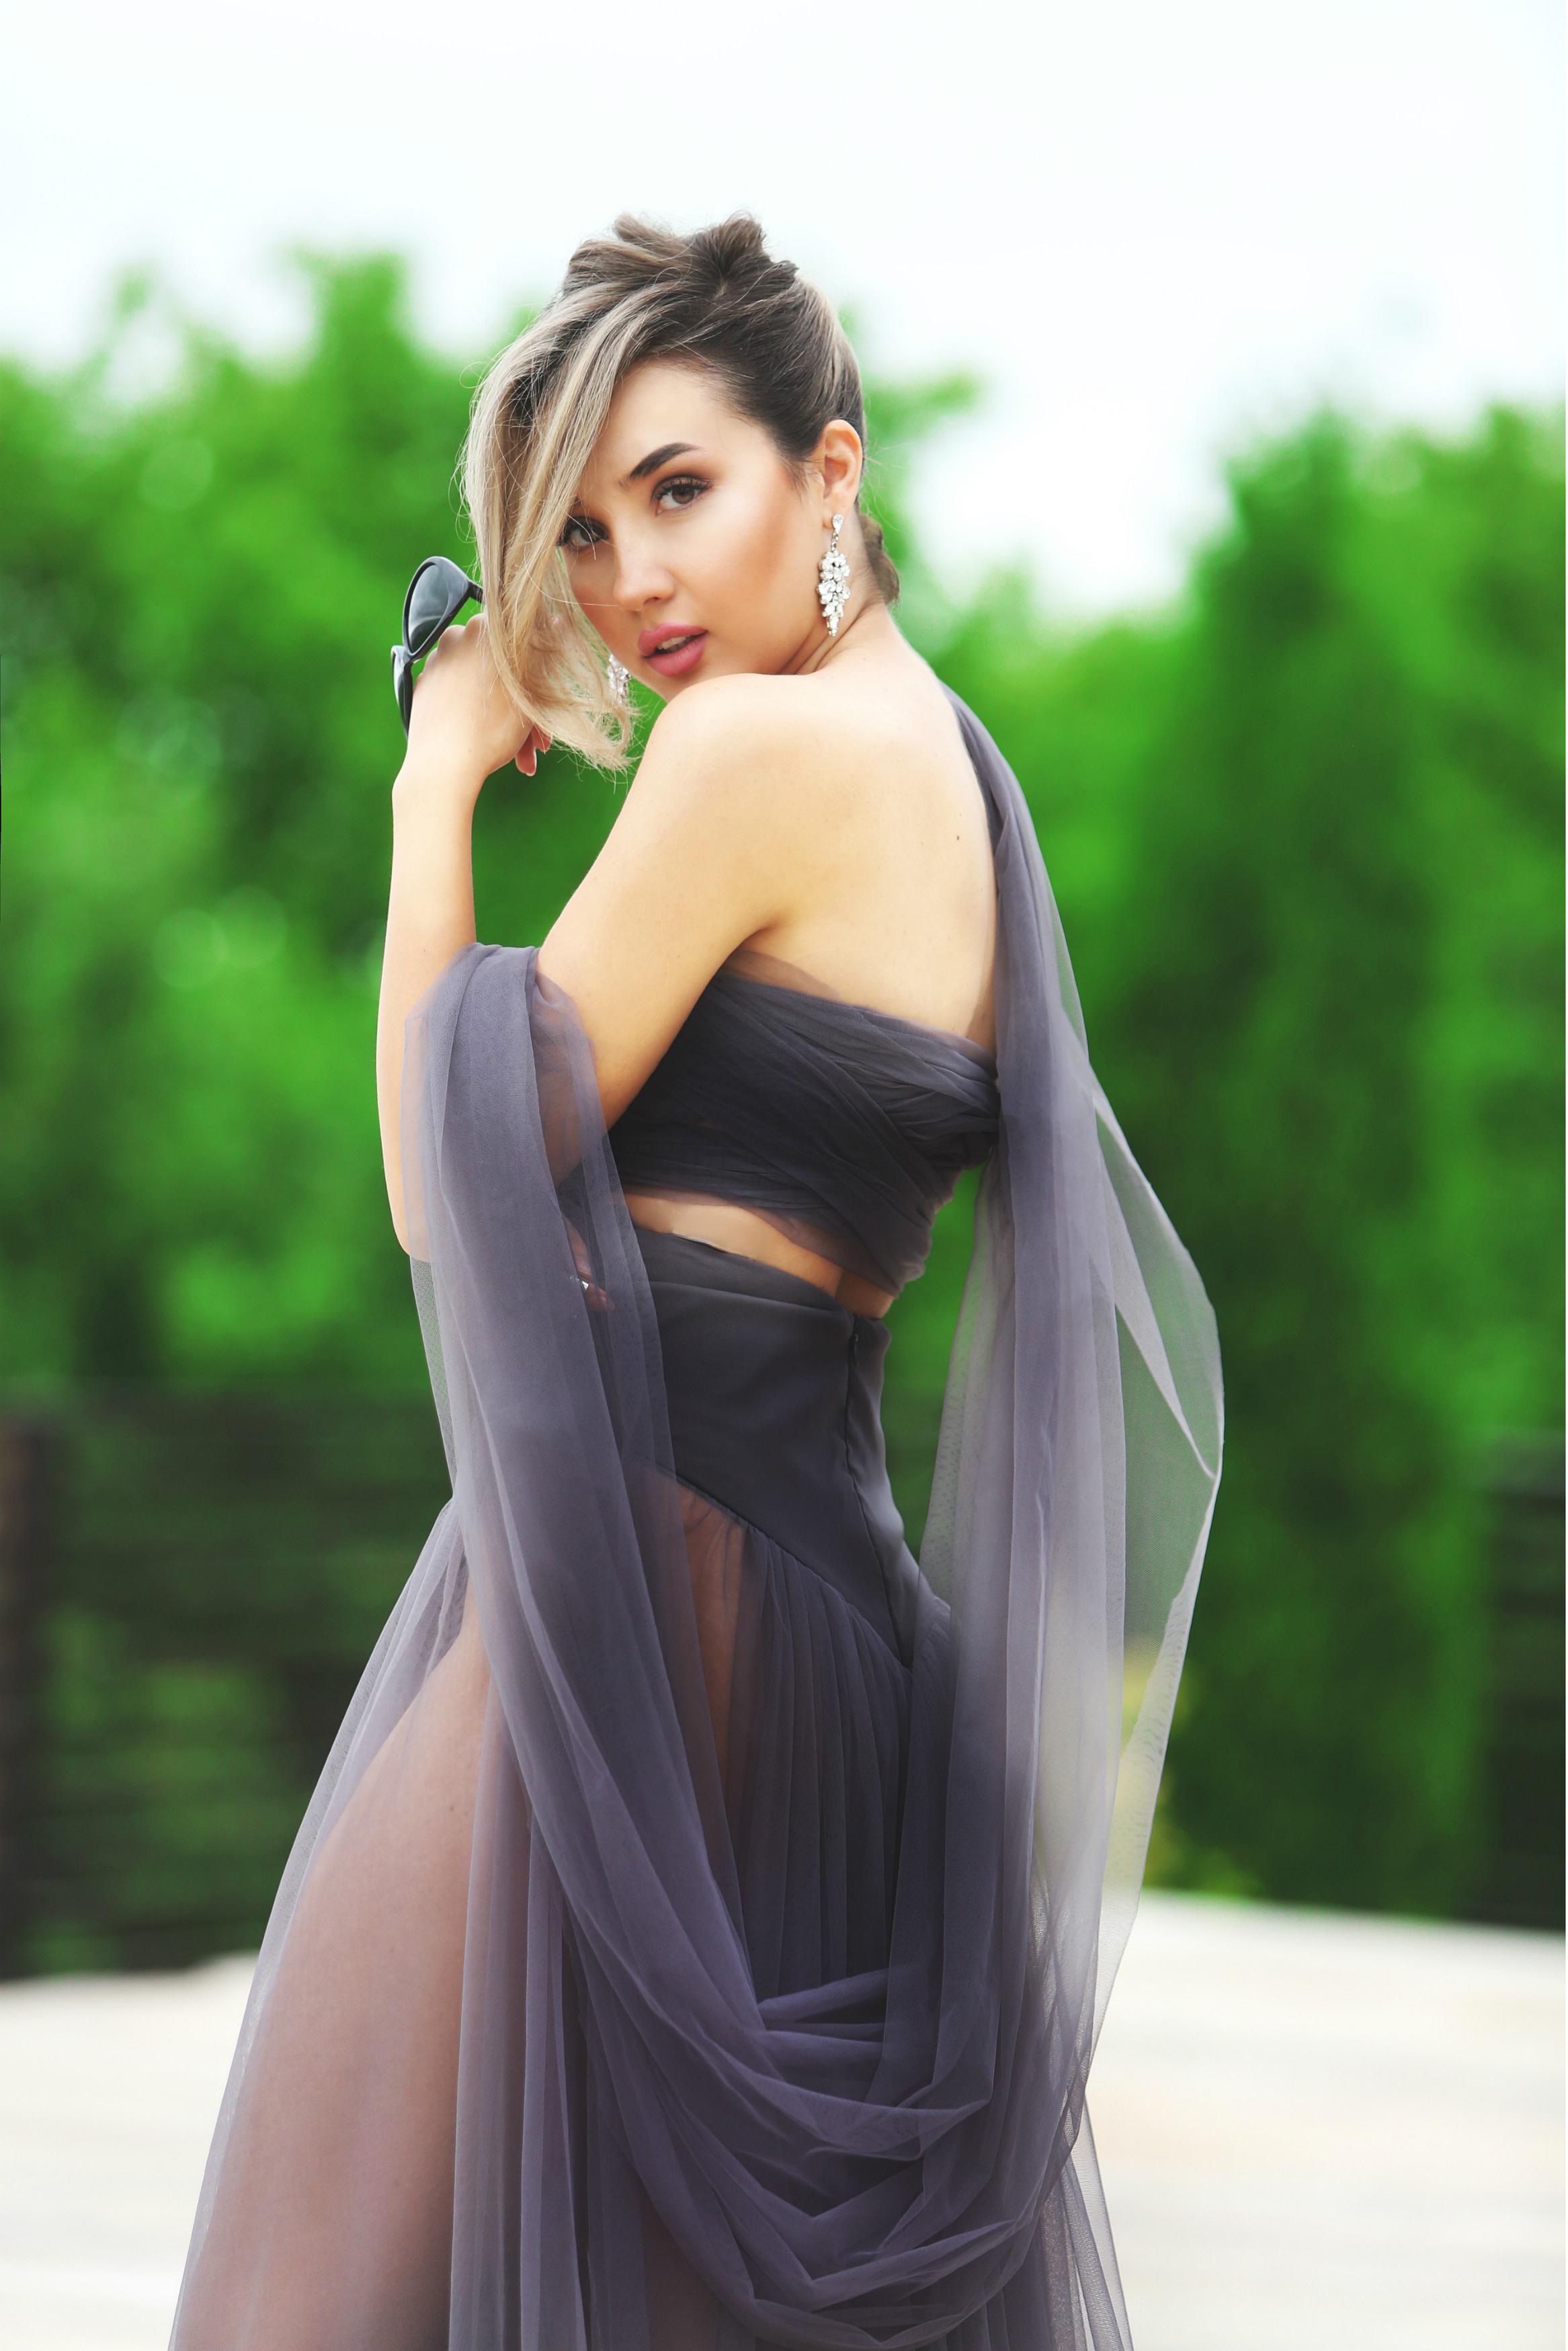 Diana Rogo Dress Banchet 05 a.jpg